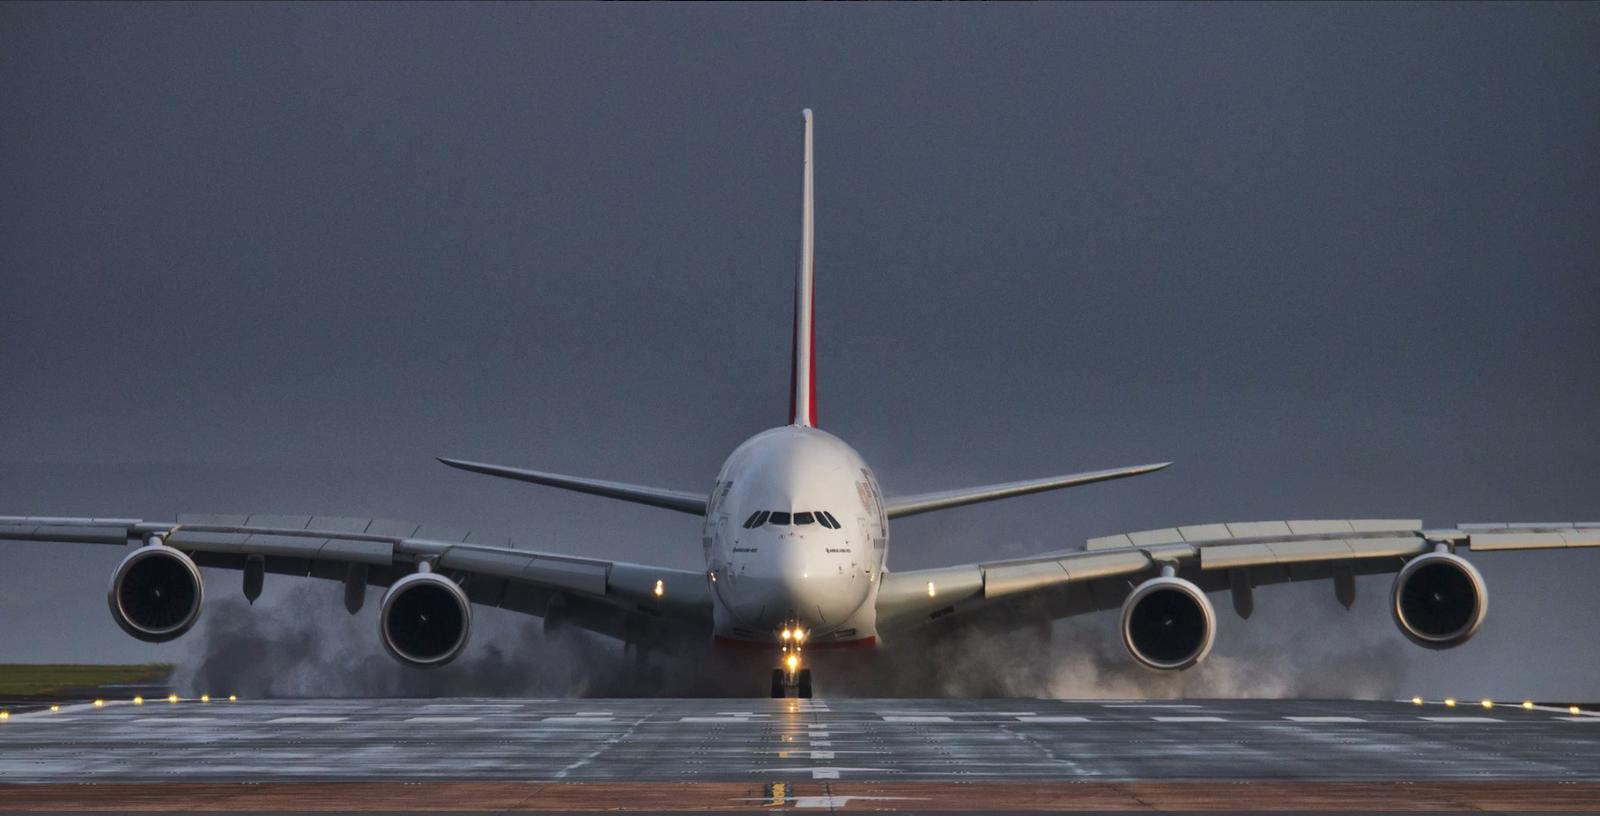 Обои 380, А-380, Самолёт, аэробус. Авиация